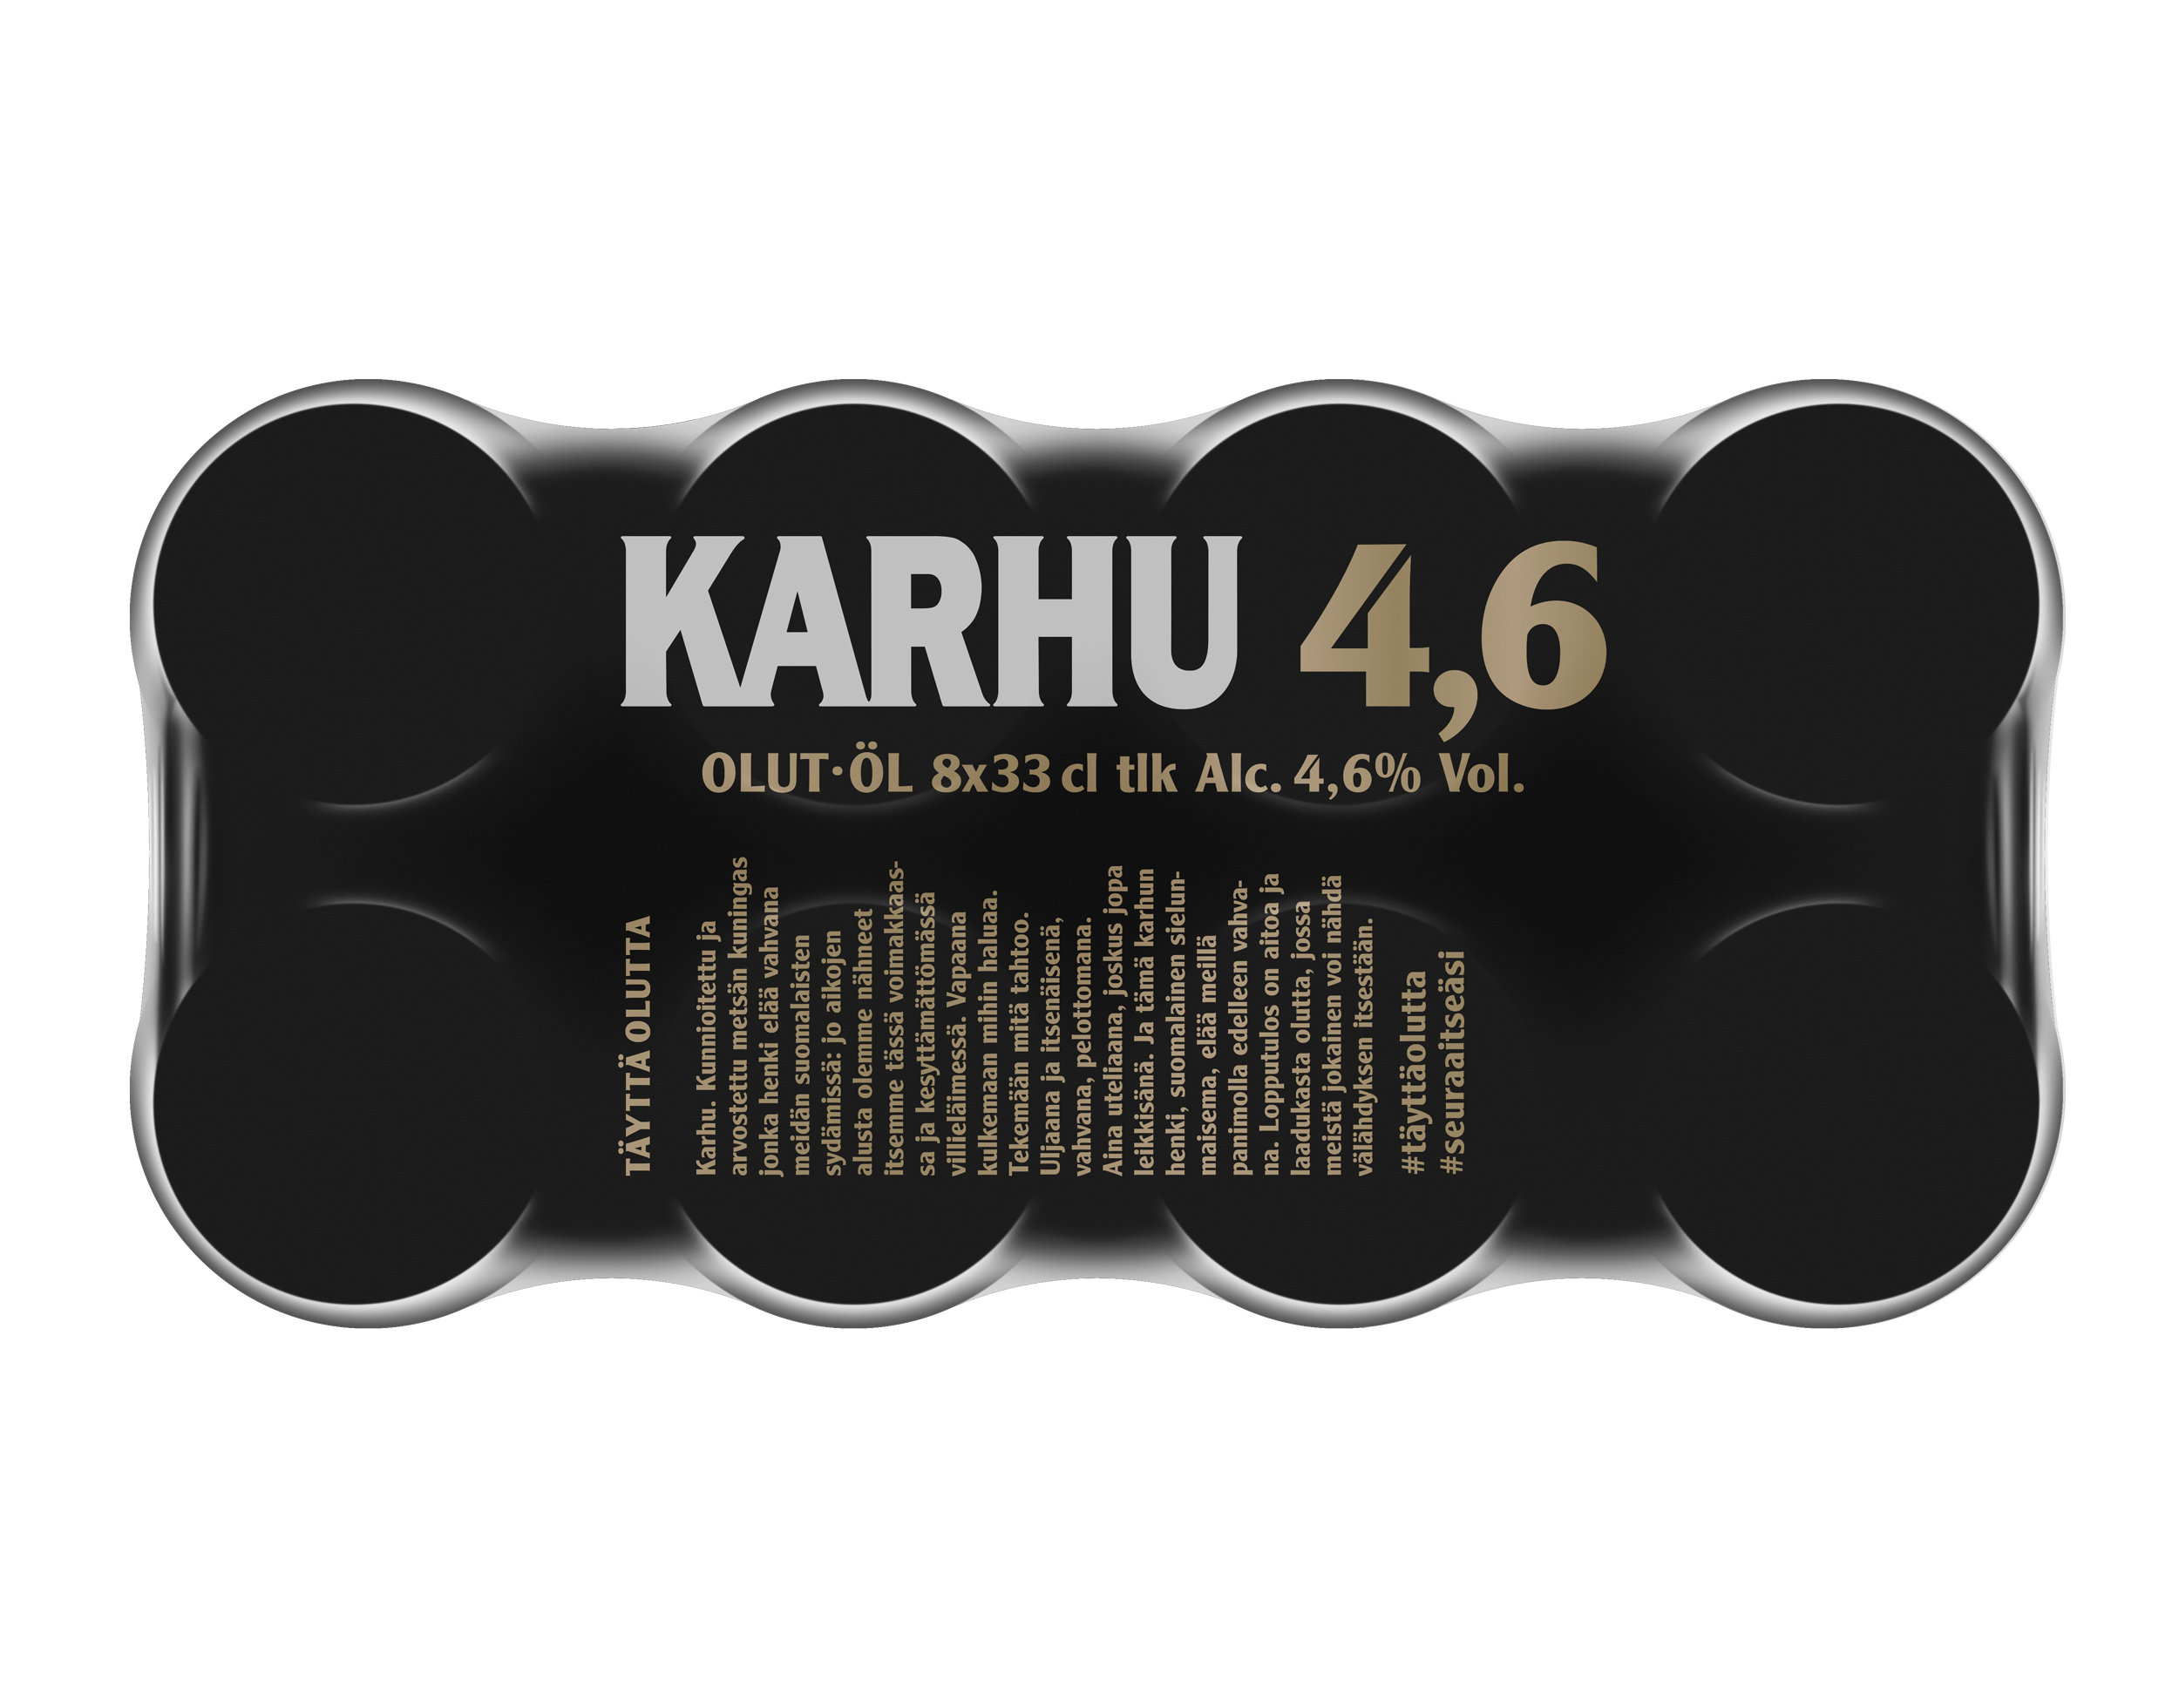 KARHU_shrink_top